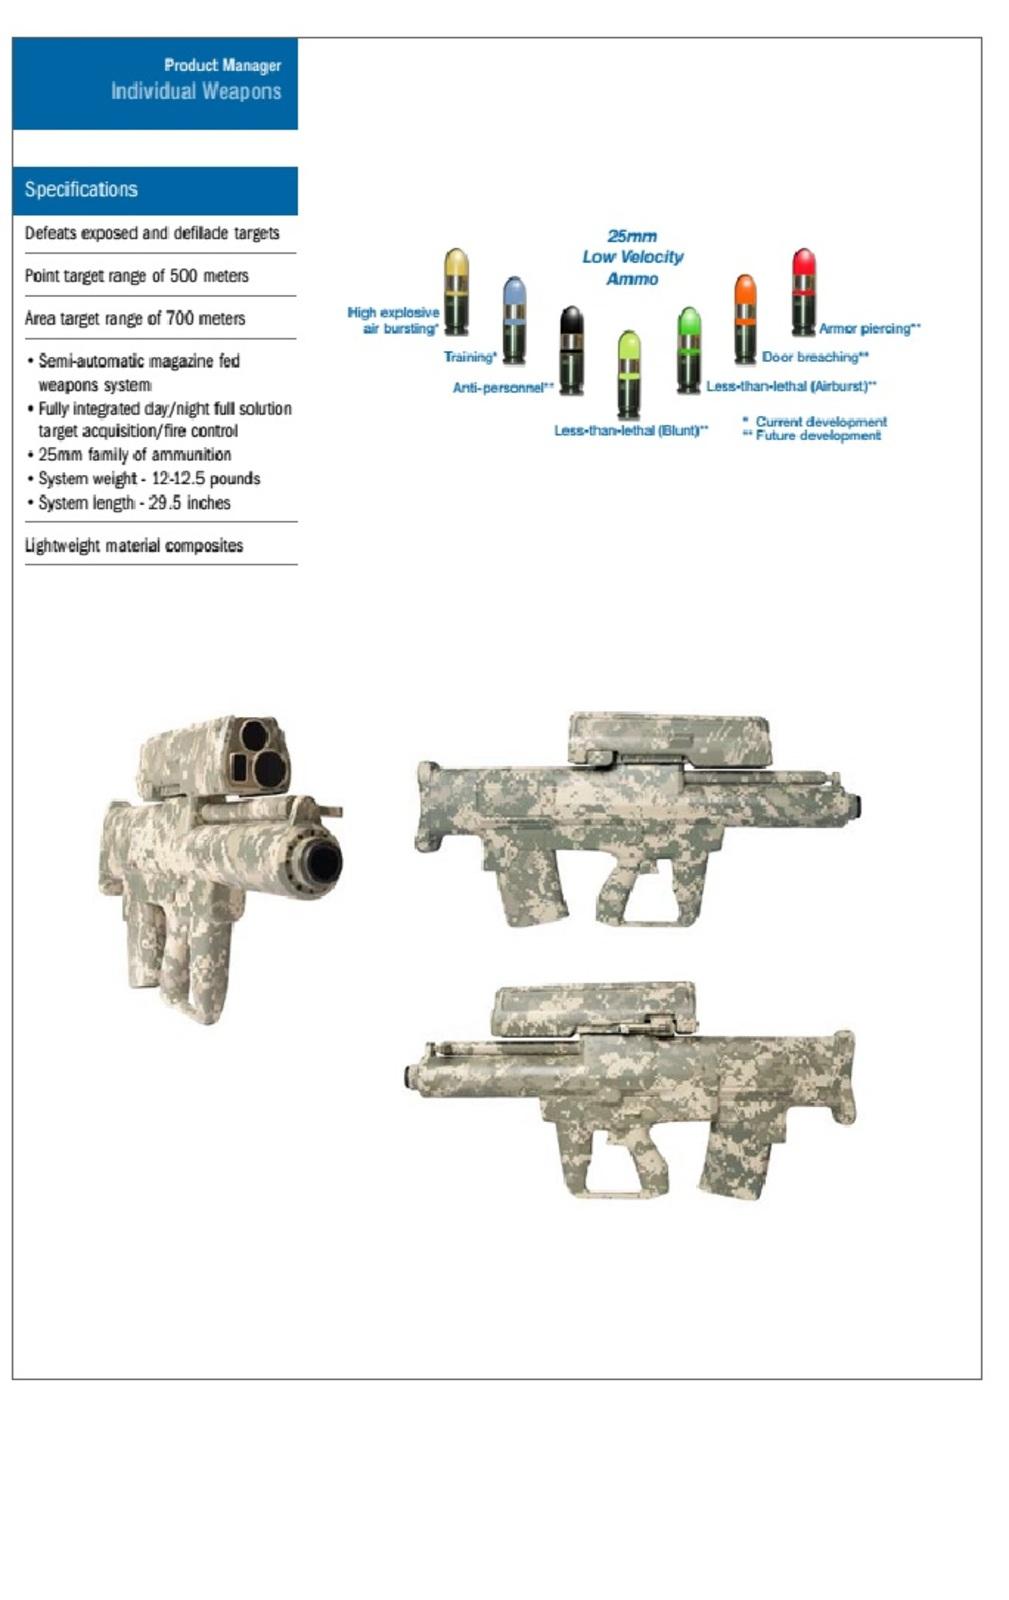 infanteria - FUSIL XM-25 DE INFANTERIA TACTICO  (COUNTER DEFILADE TARGET ENGAGEMENT SYSTEM)  XM_25_COUNTERDEFILADEENGAGEMENTSYSTEM